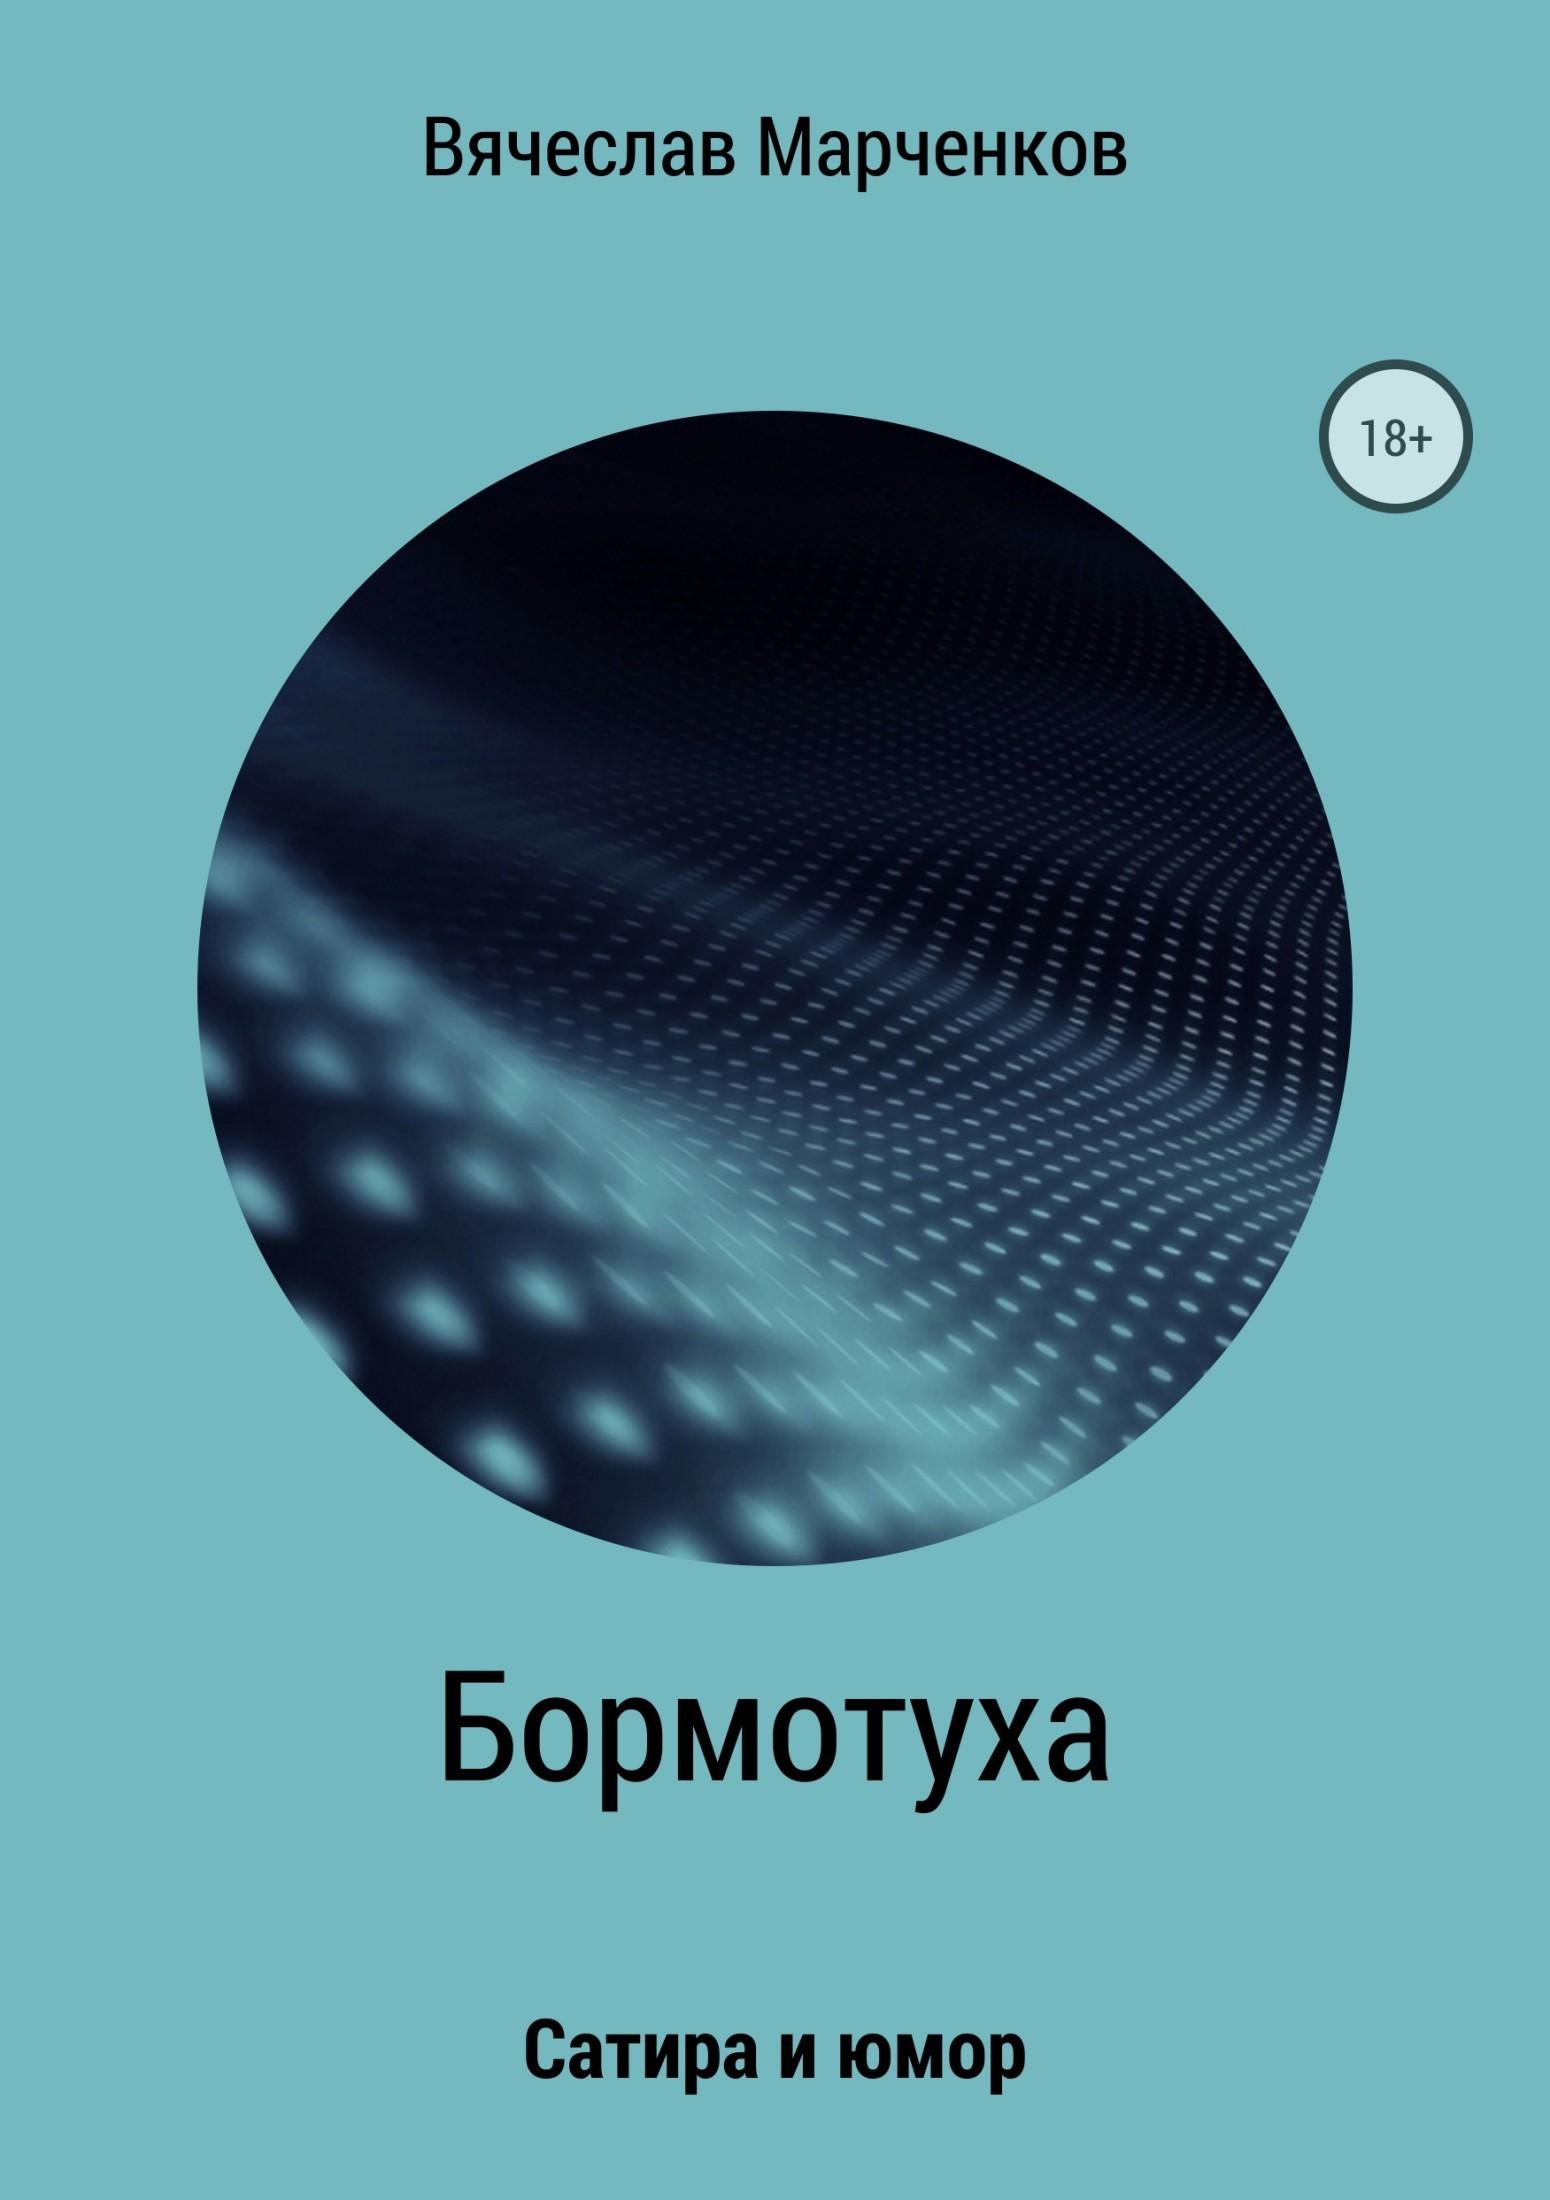 Вячеслав Викторович Марченков Бормотуха. Сборник рассказов